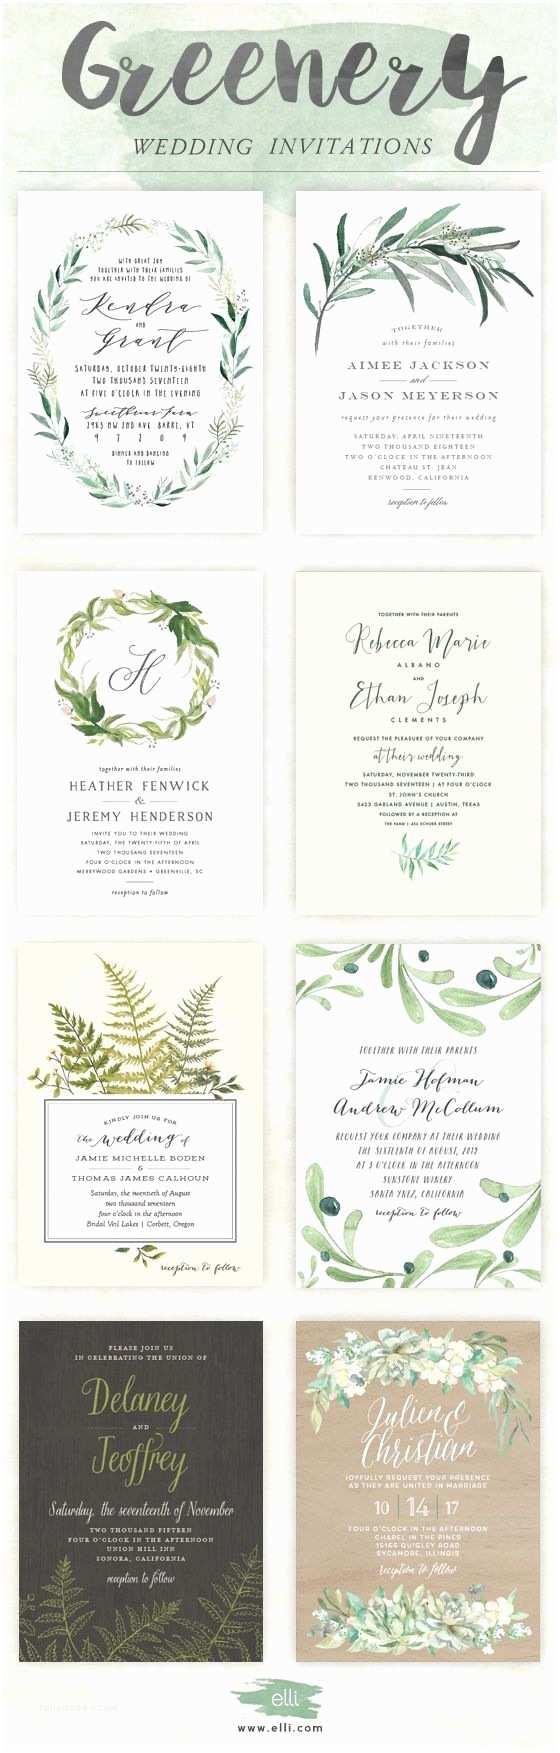 Elli Wedding Invitations Trending for 2017 Greenery Wedding Invitations From Elli